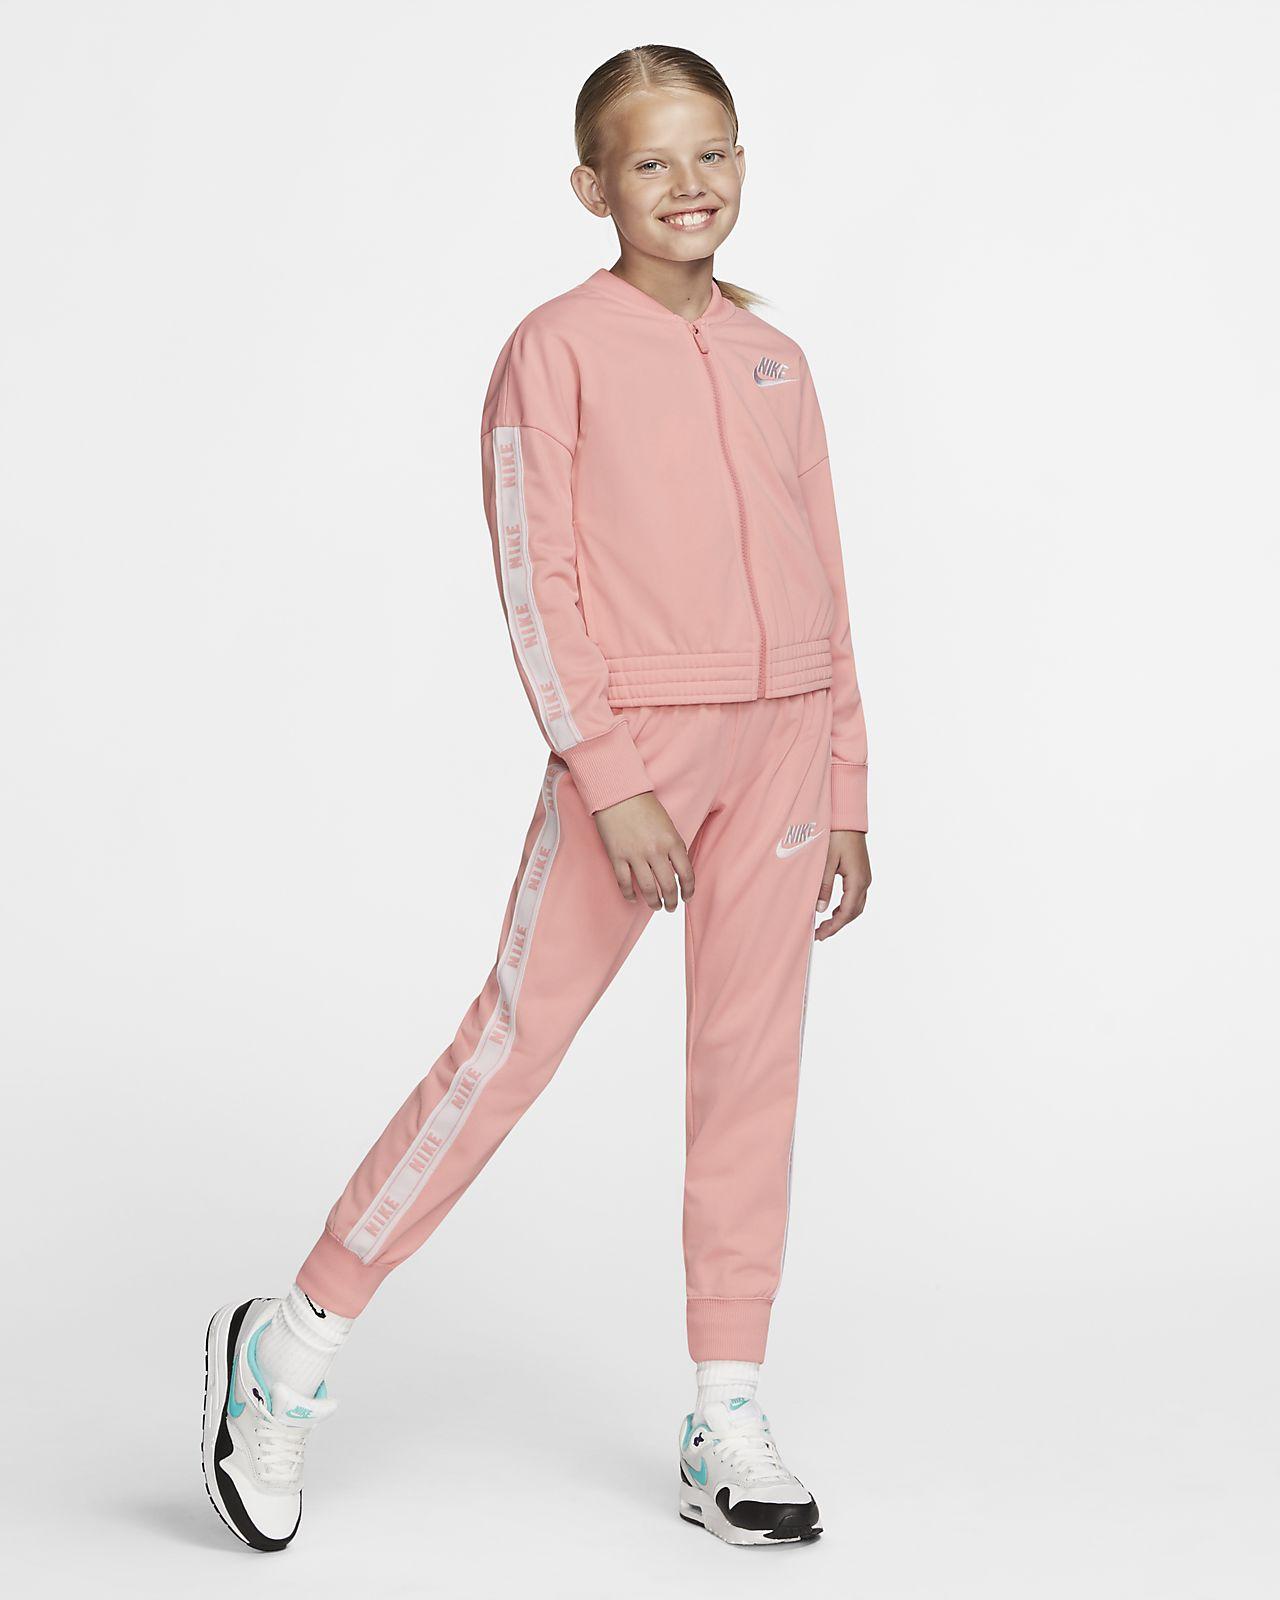 Nike Sportswear Mädchen-Trainingsanzug